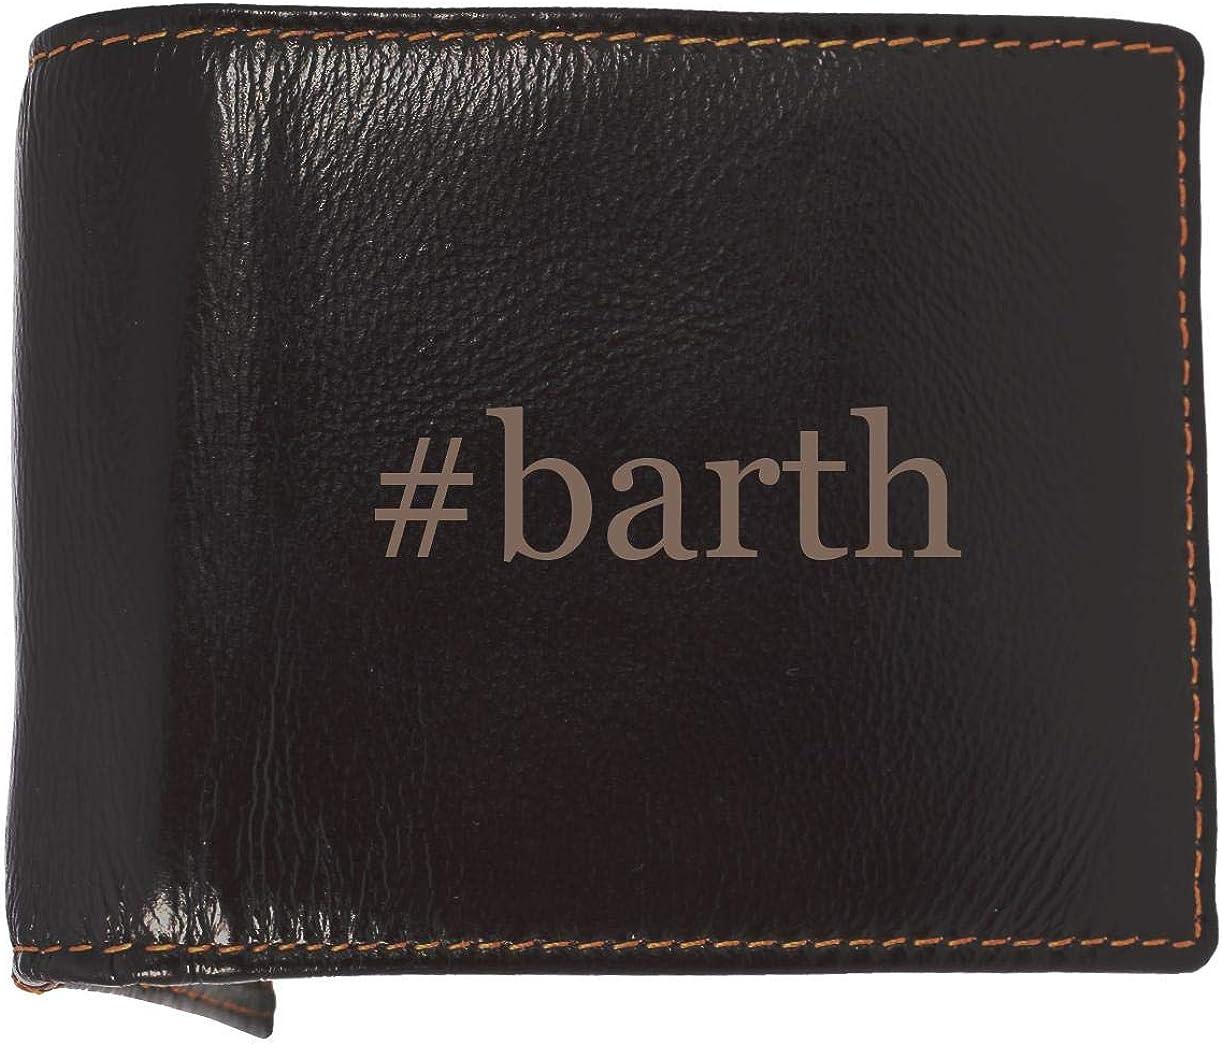 #barth - Soft Hashtag Cowhide Genuine Engraved Bifold Leather Wallet 61RTKBISppL